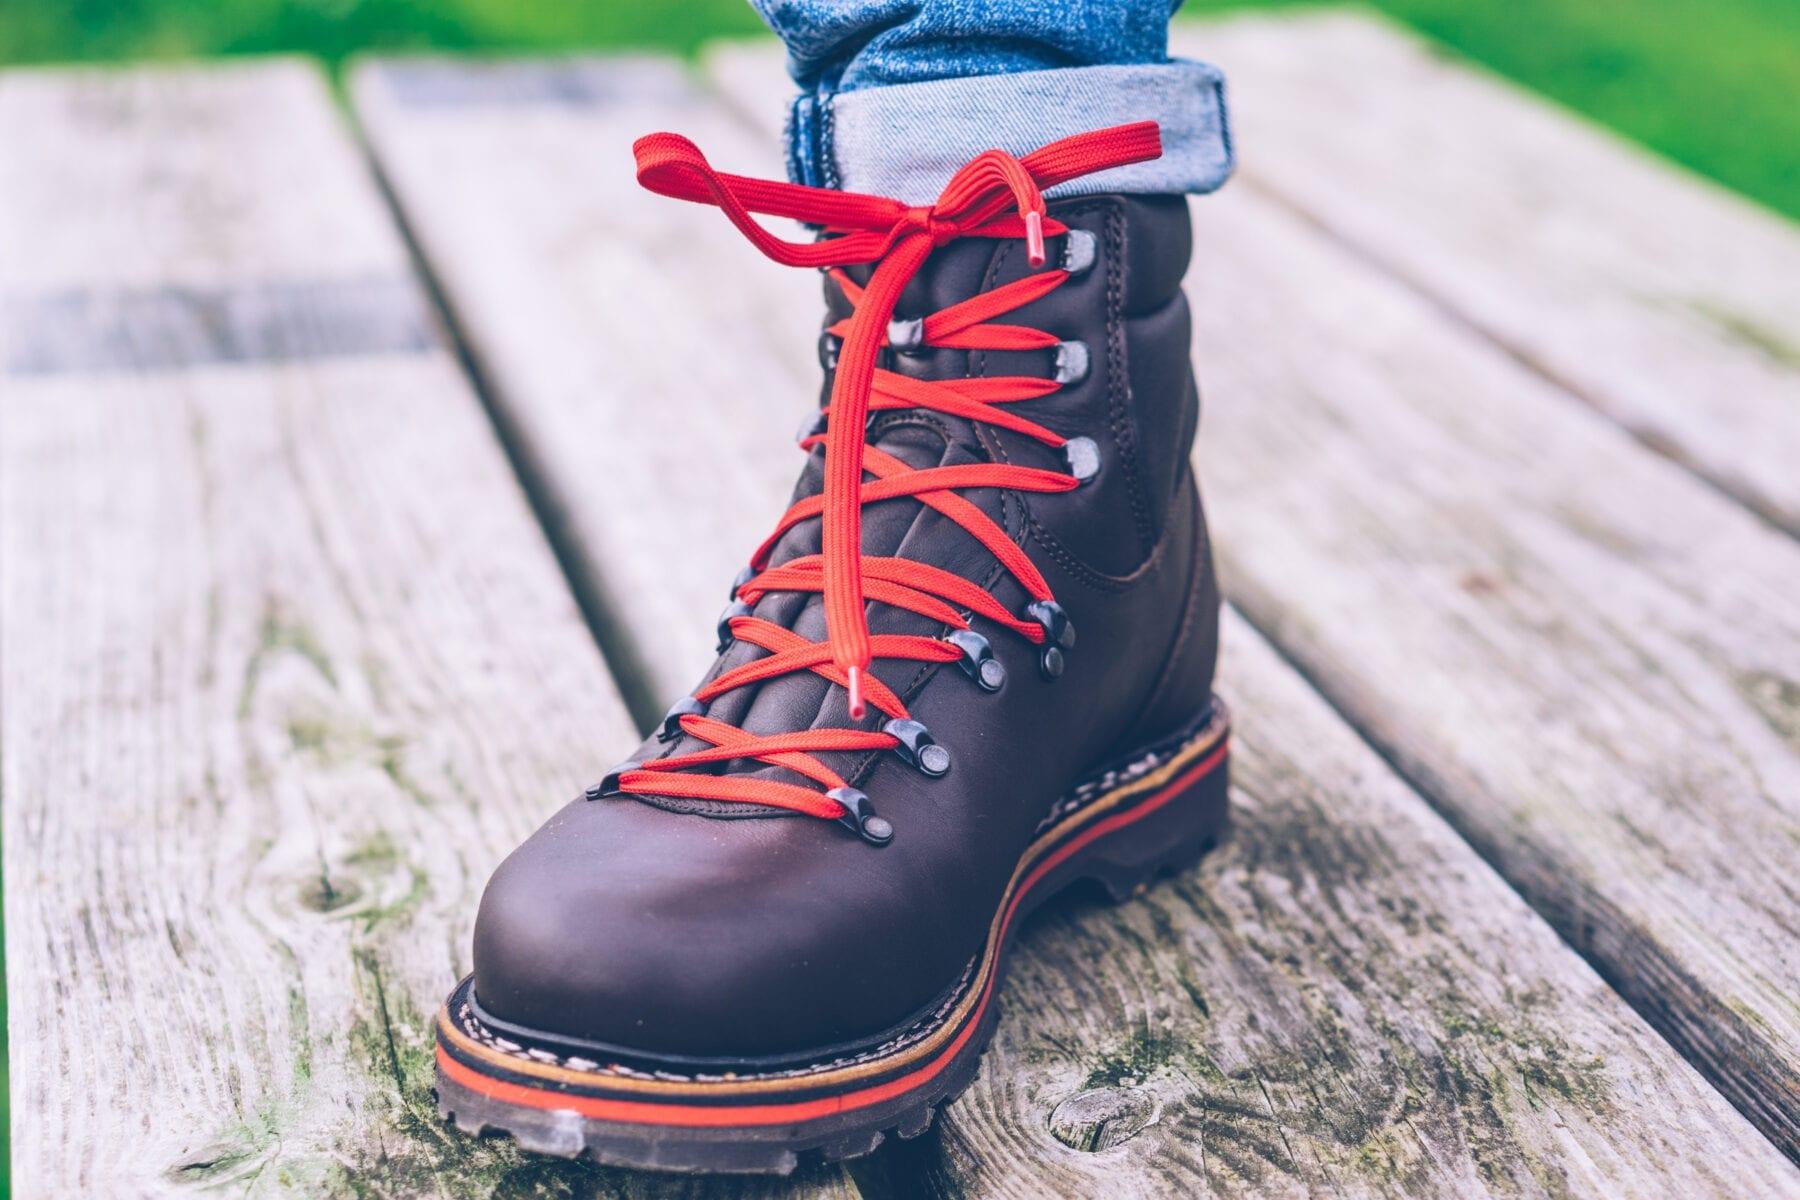 Hanwag Grünten Winter schoen